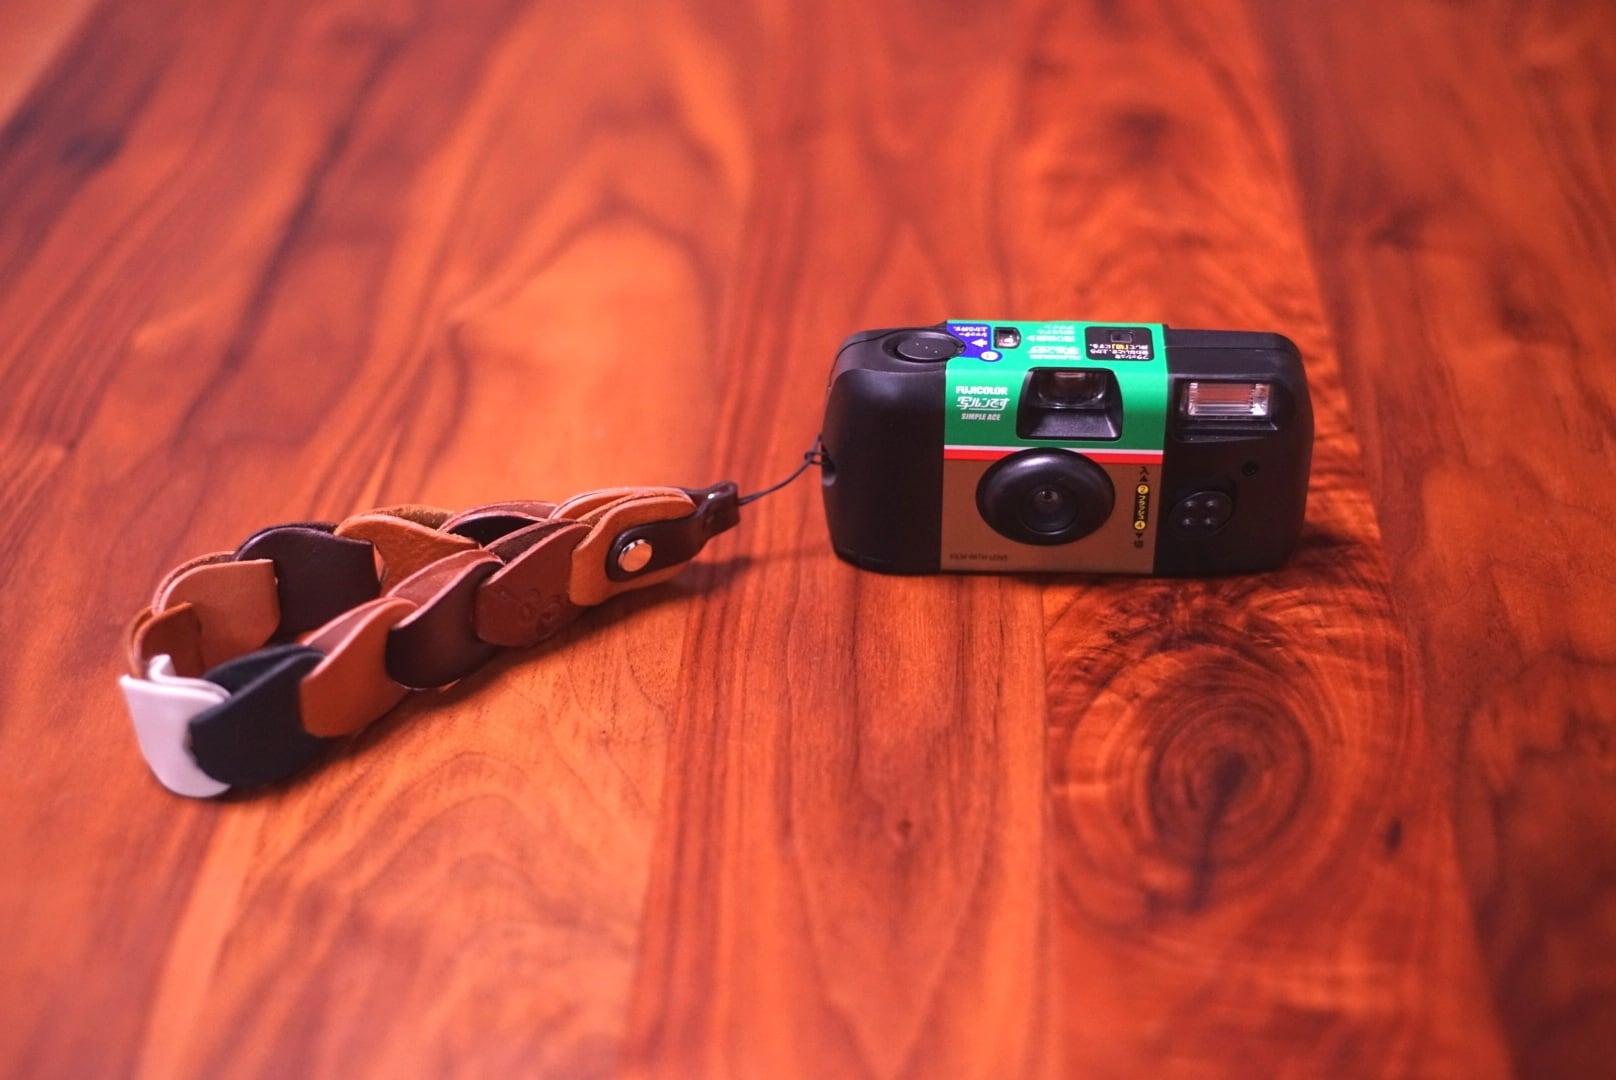 folklole mini / Hand Strap #12【ウロコのようなカメラストラップ】